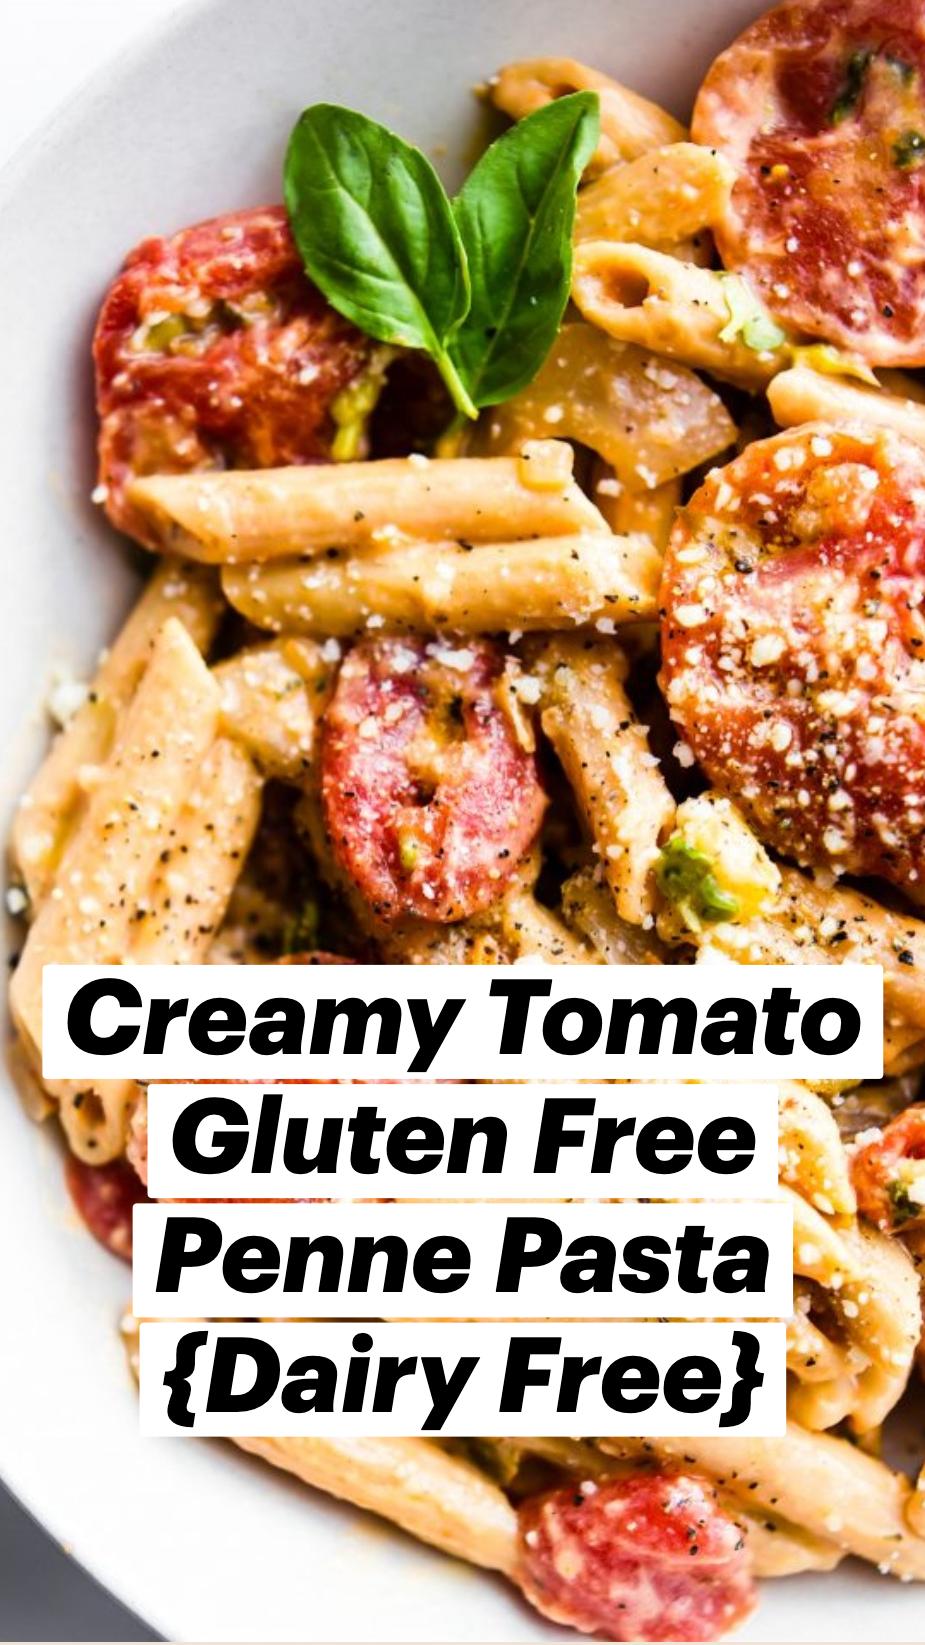 Creamy Tomato Gluten Free Penne Pasta {Dairy Free}